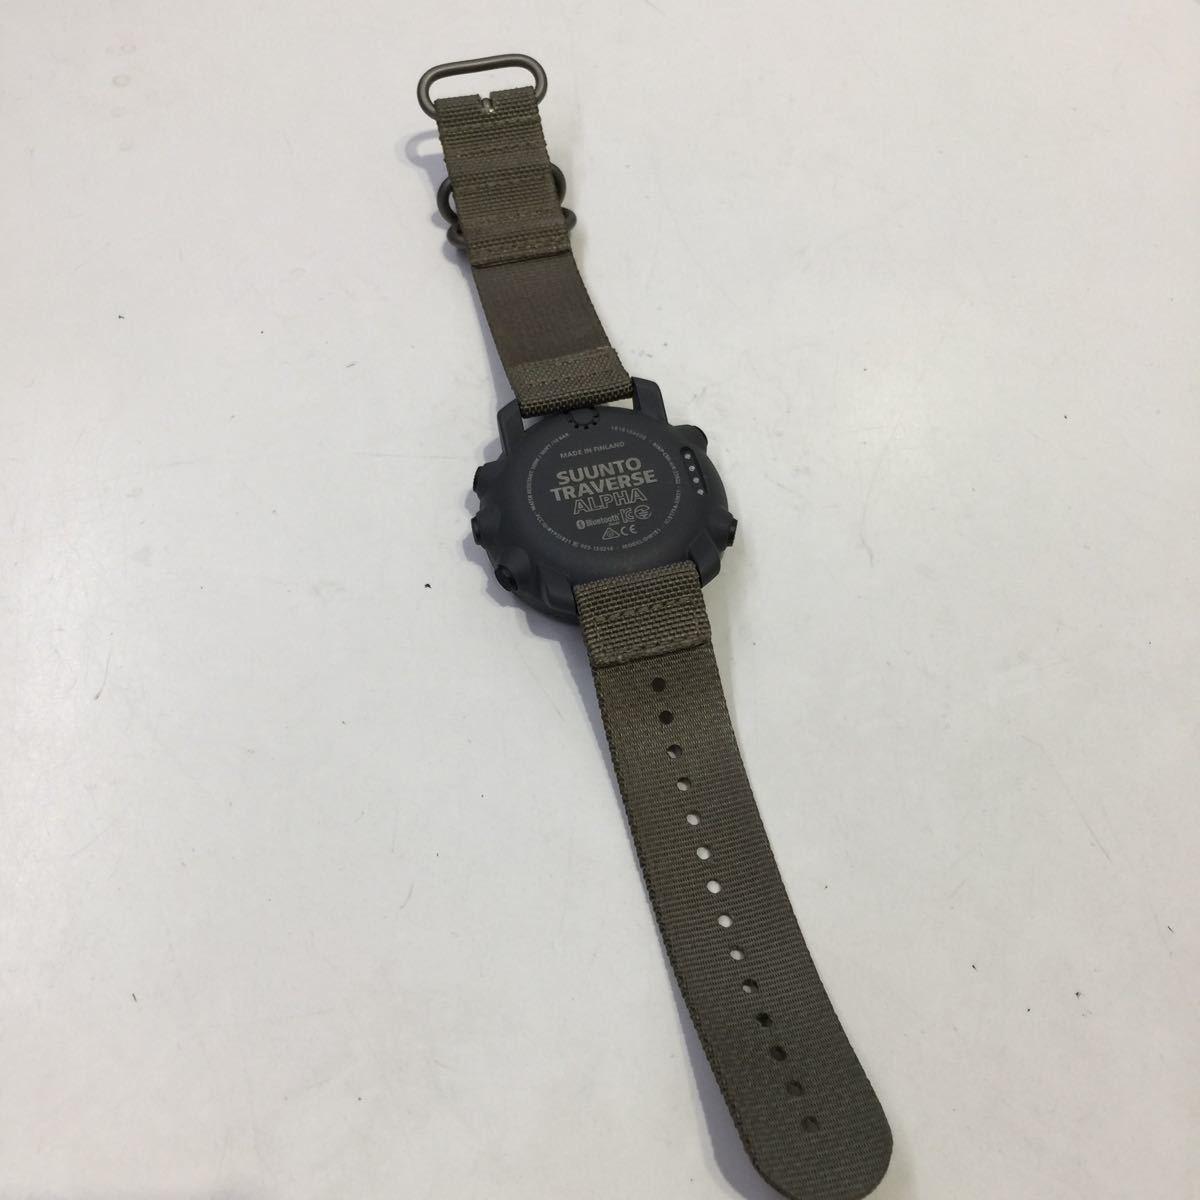 【SUUNTO スント】トラバースアルファフォリッジ TRAVERSE ALPHA FOLIAGE 腕時計 デジタル腕時計 デジタル アウトドアウォッチ アウトドア_画像8